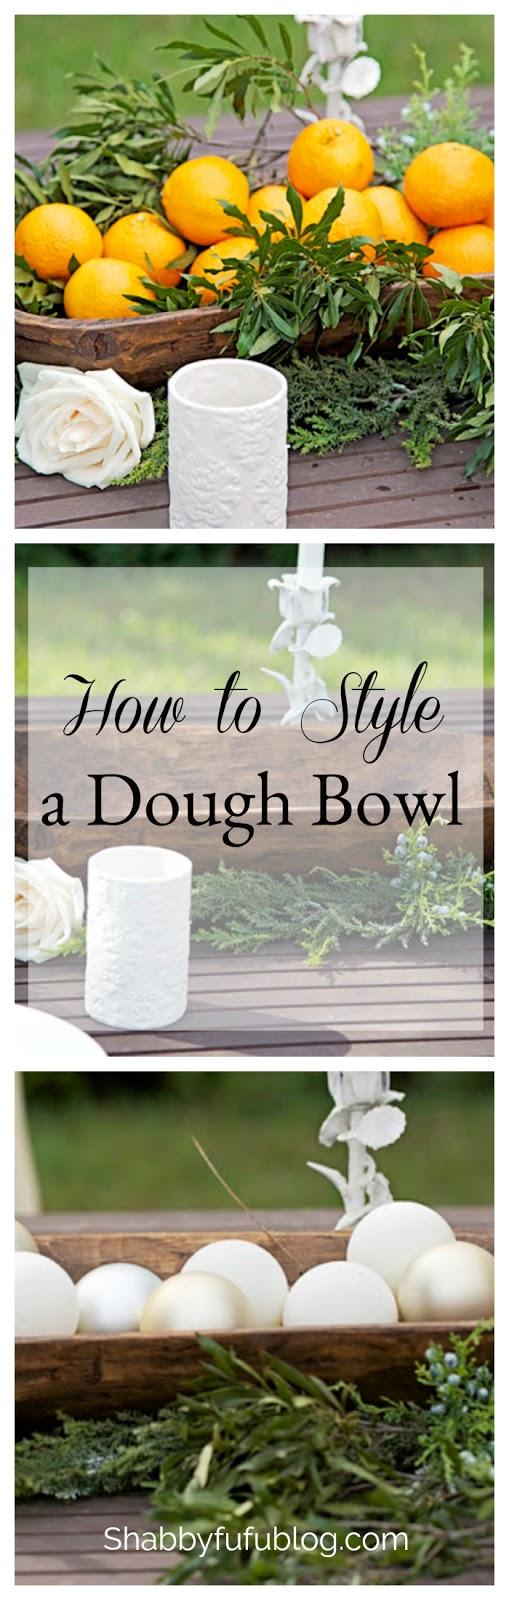 How To Style A Dough Bowl - shabbyfufublog.com